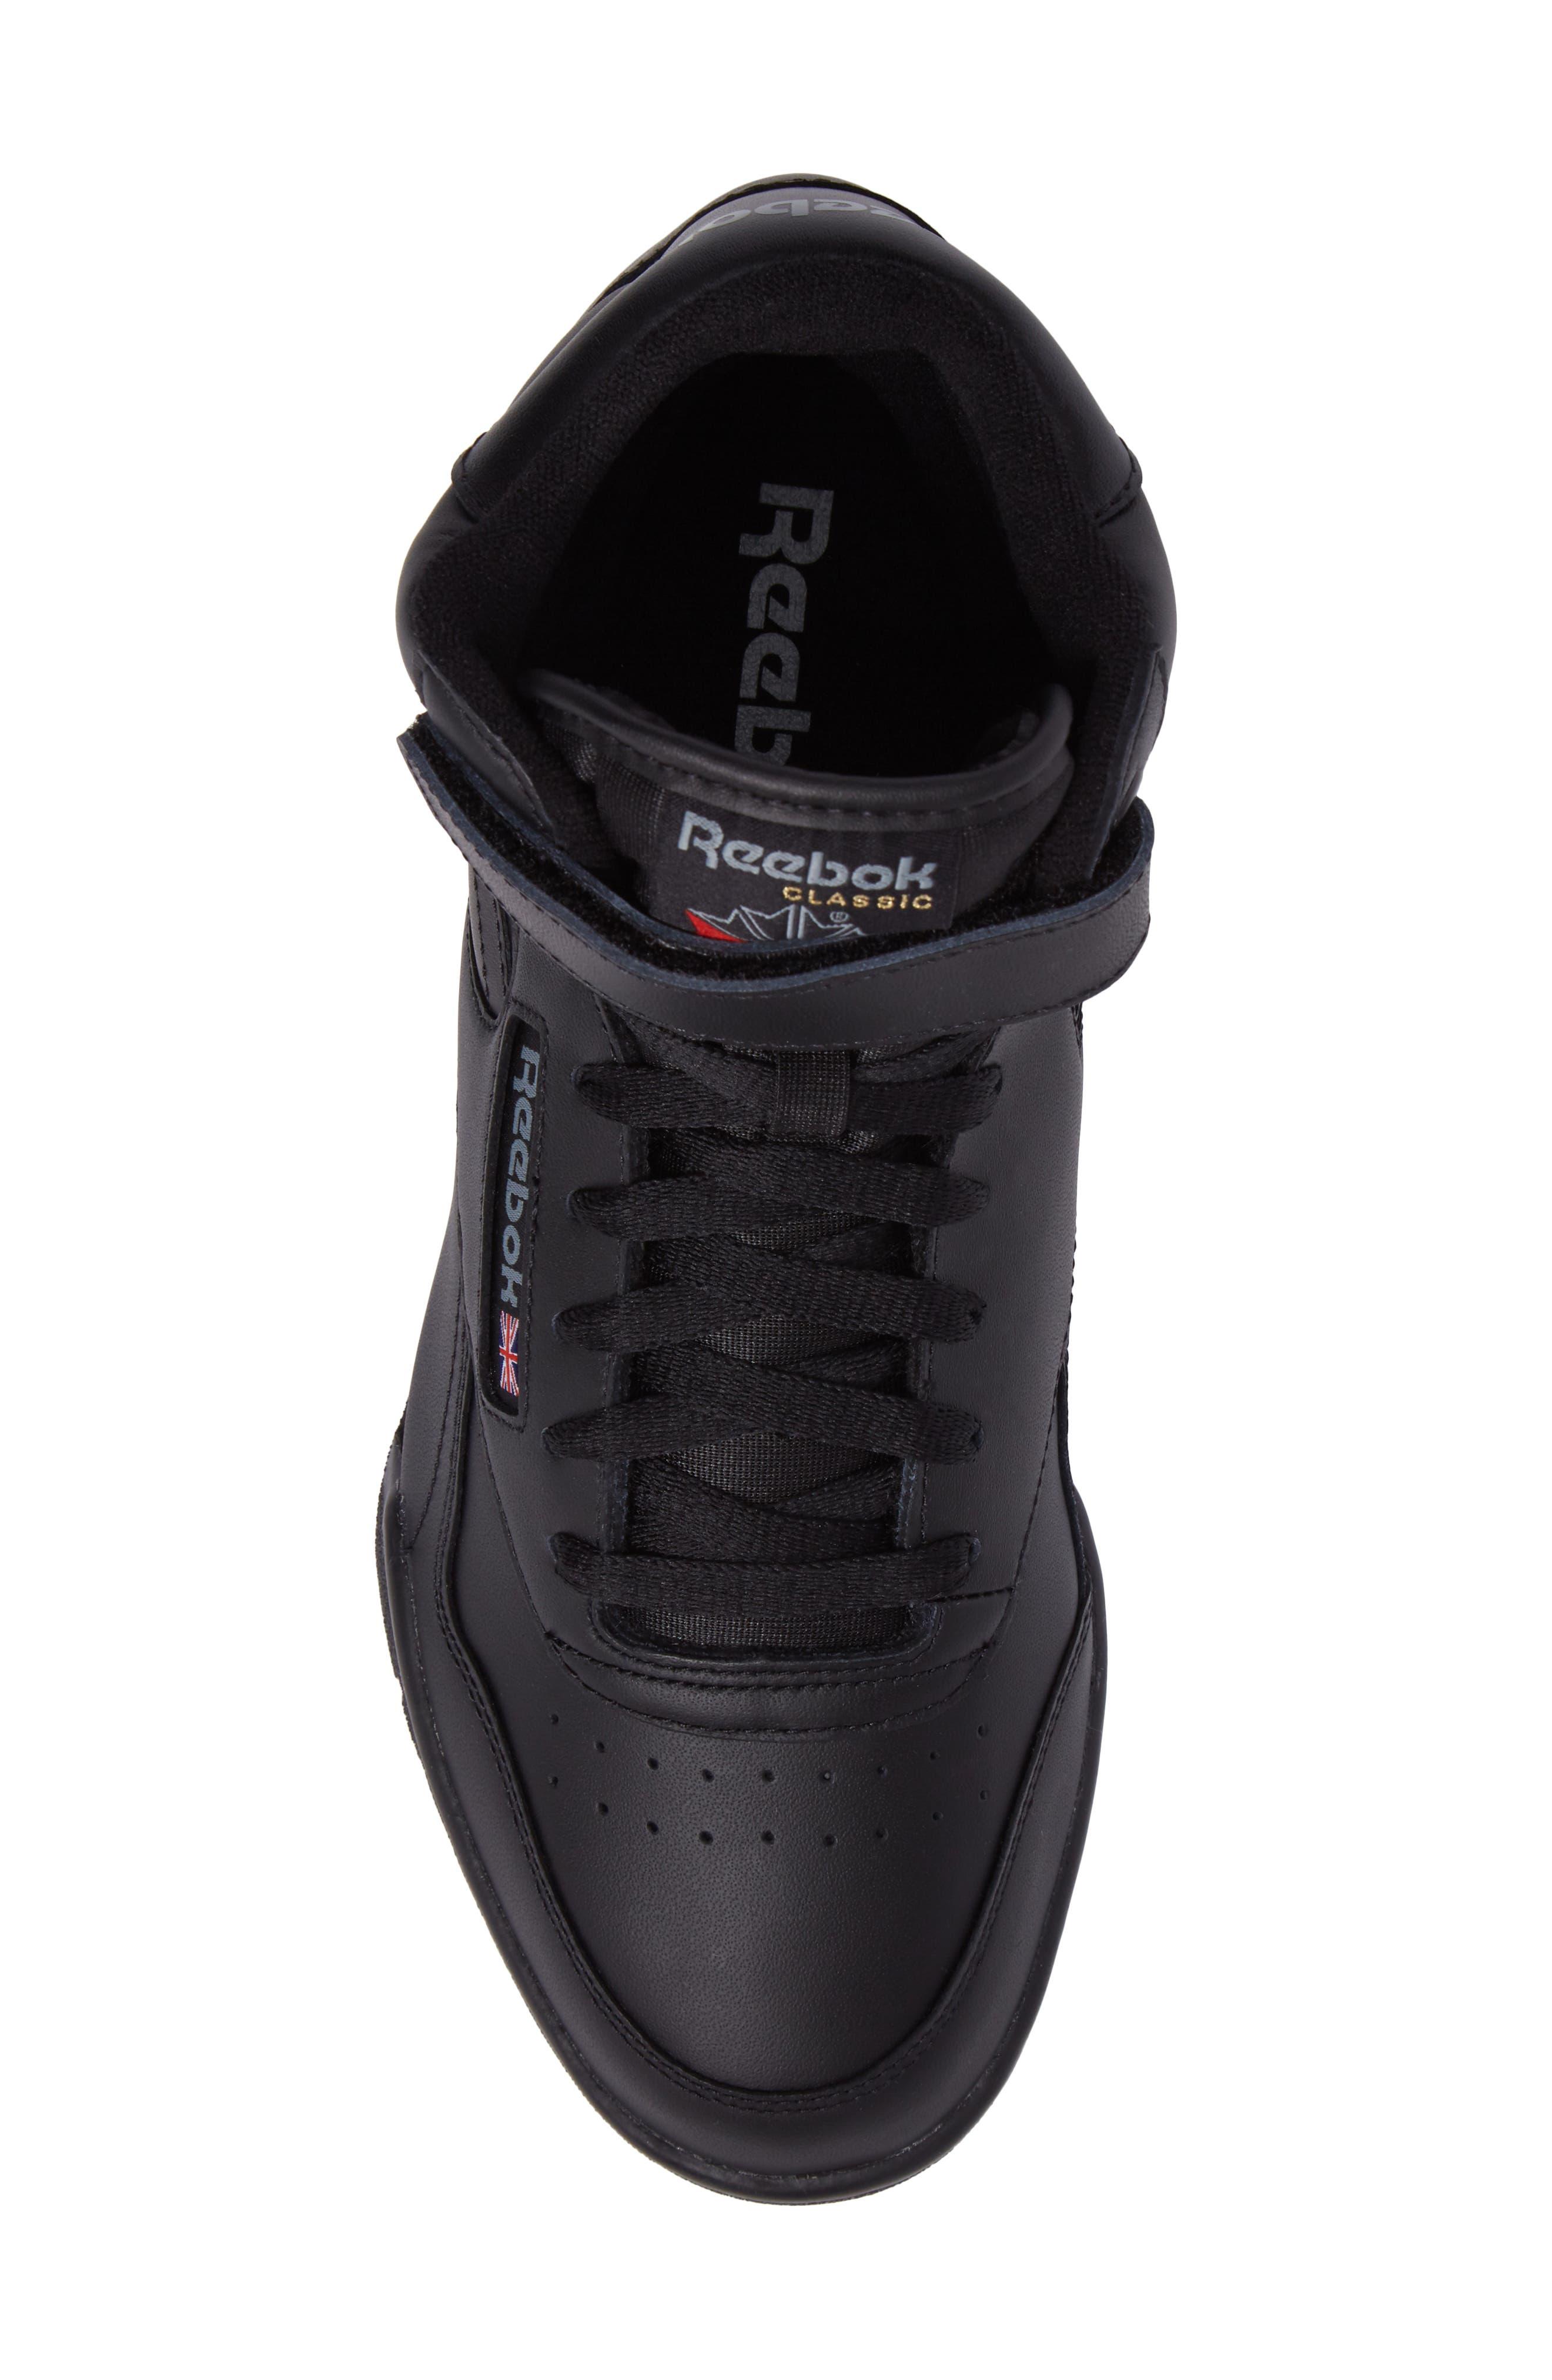 Ex-O-Fit Hi Sneaker,                             Alternate thumbnail 5, color,                             Black